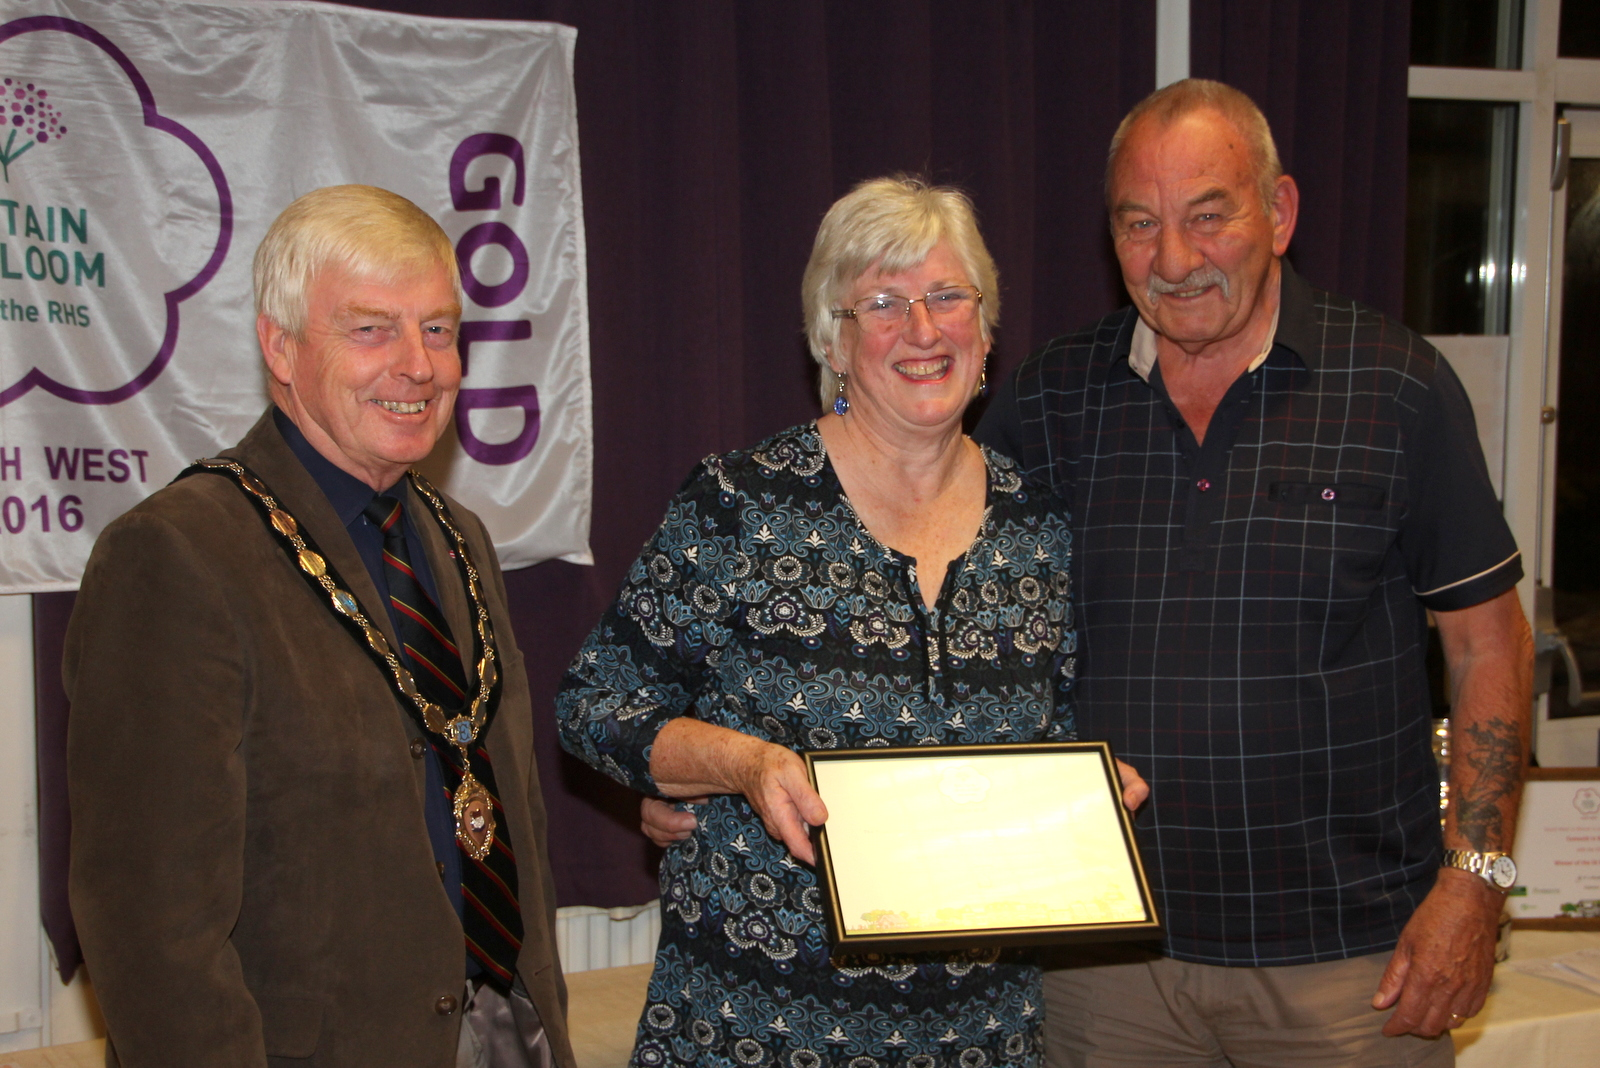 John & Lyn Rockey with 'thriving' Neighbourhood award for The Hollows